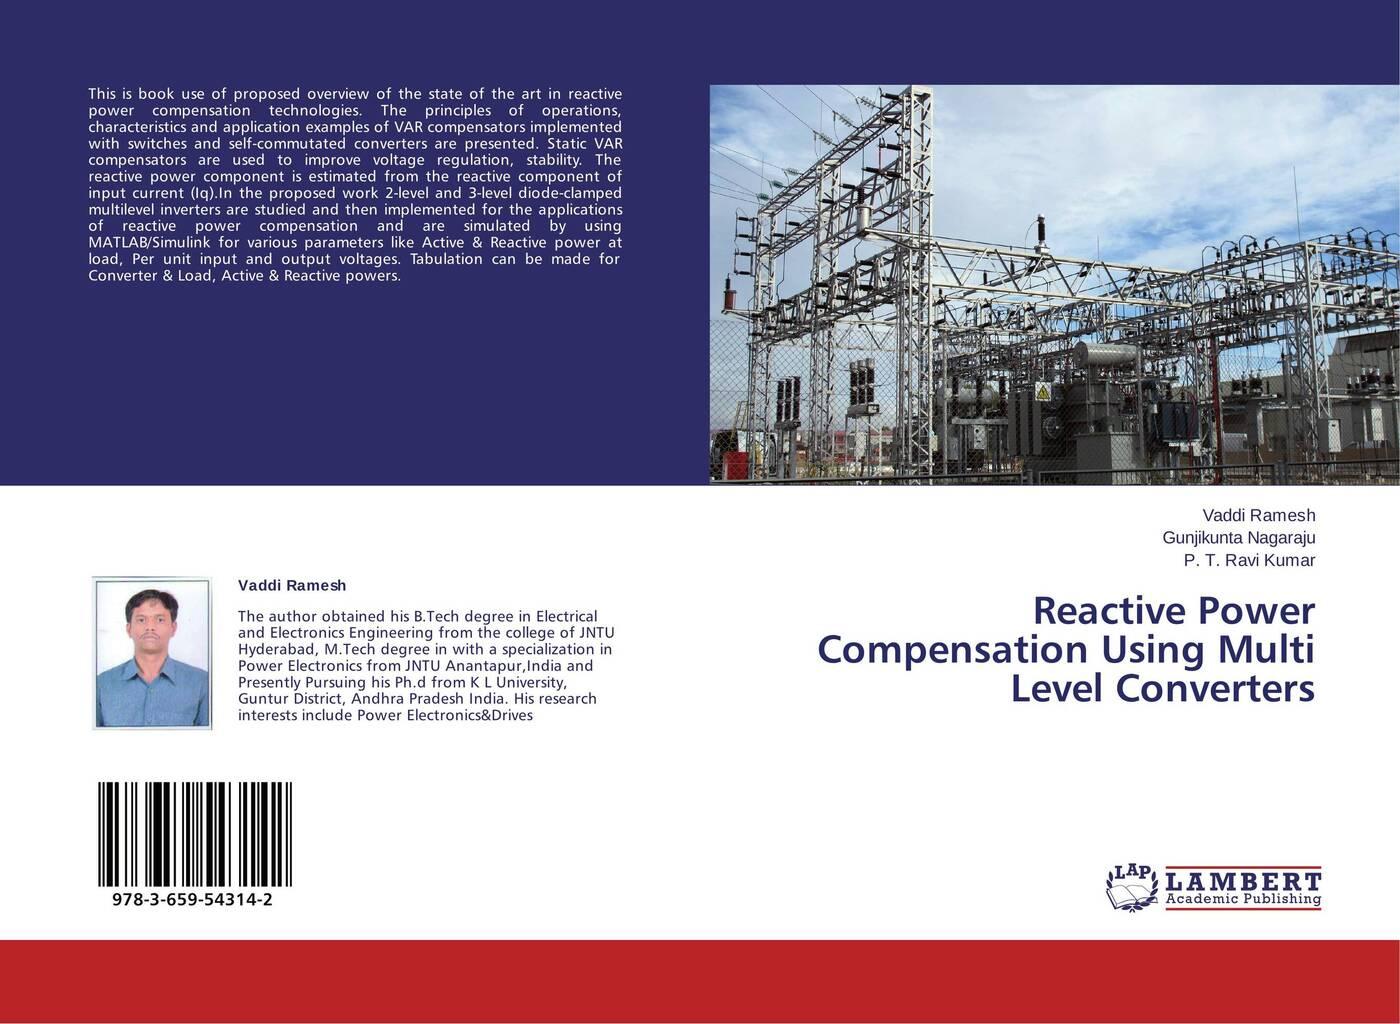 Vaddi Ramesh,Gunjikunta Nagaraju and P. T. Ravi Kumar Reactive Power Compensation Using Multi Level Converters цены онлайн